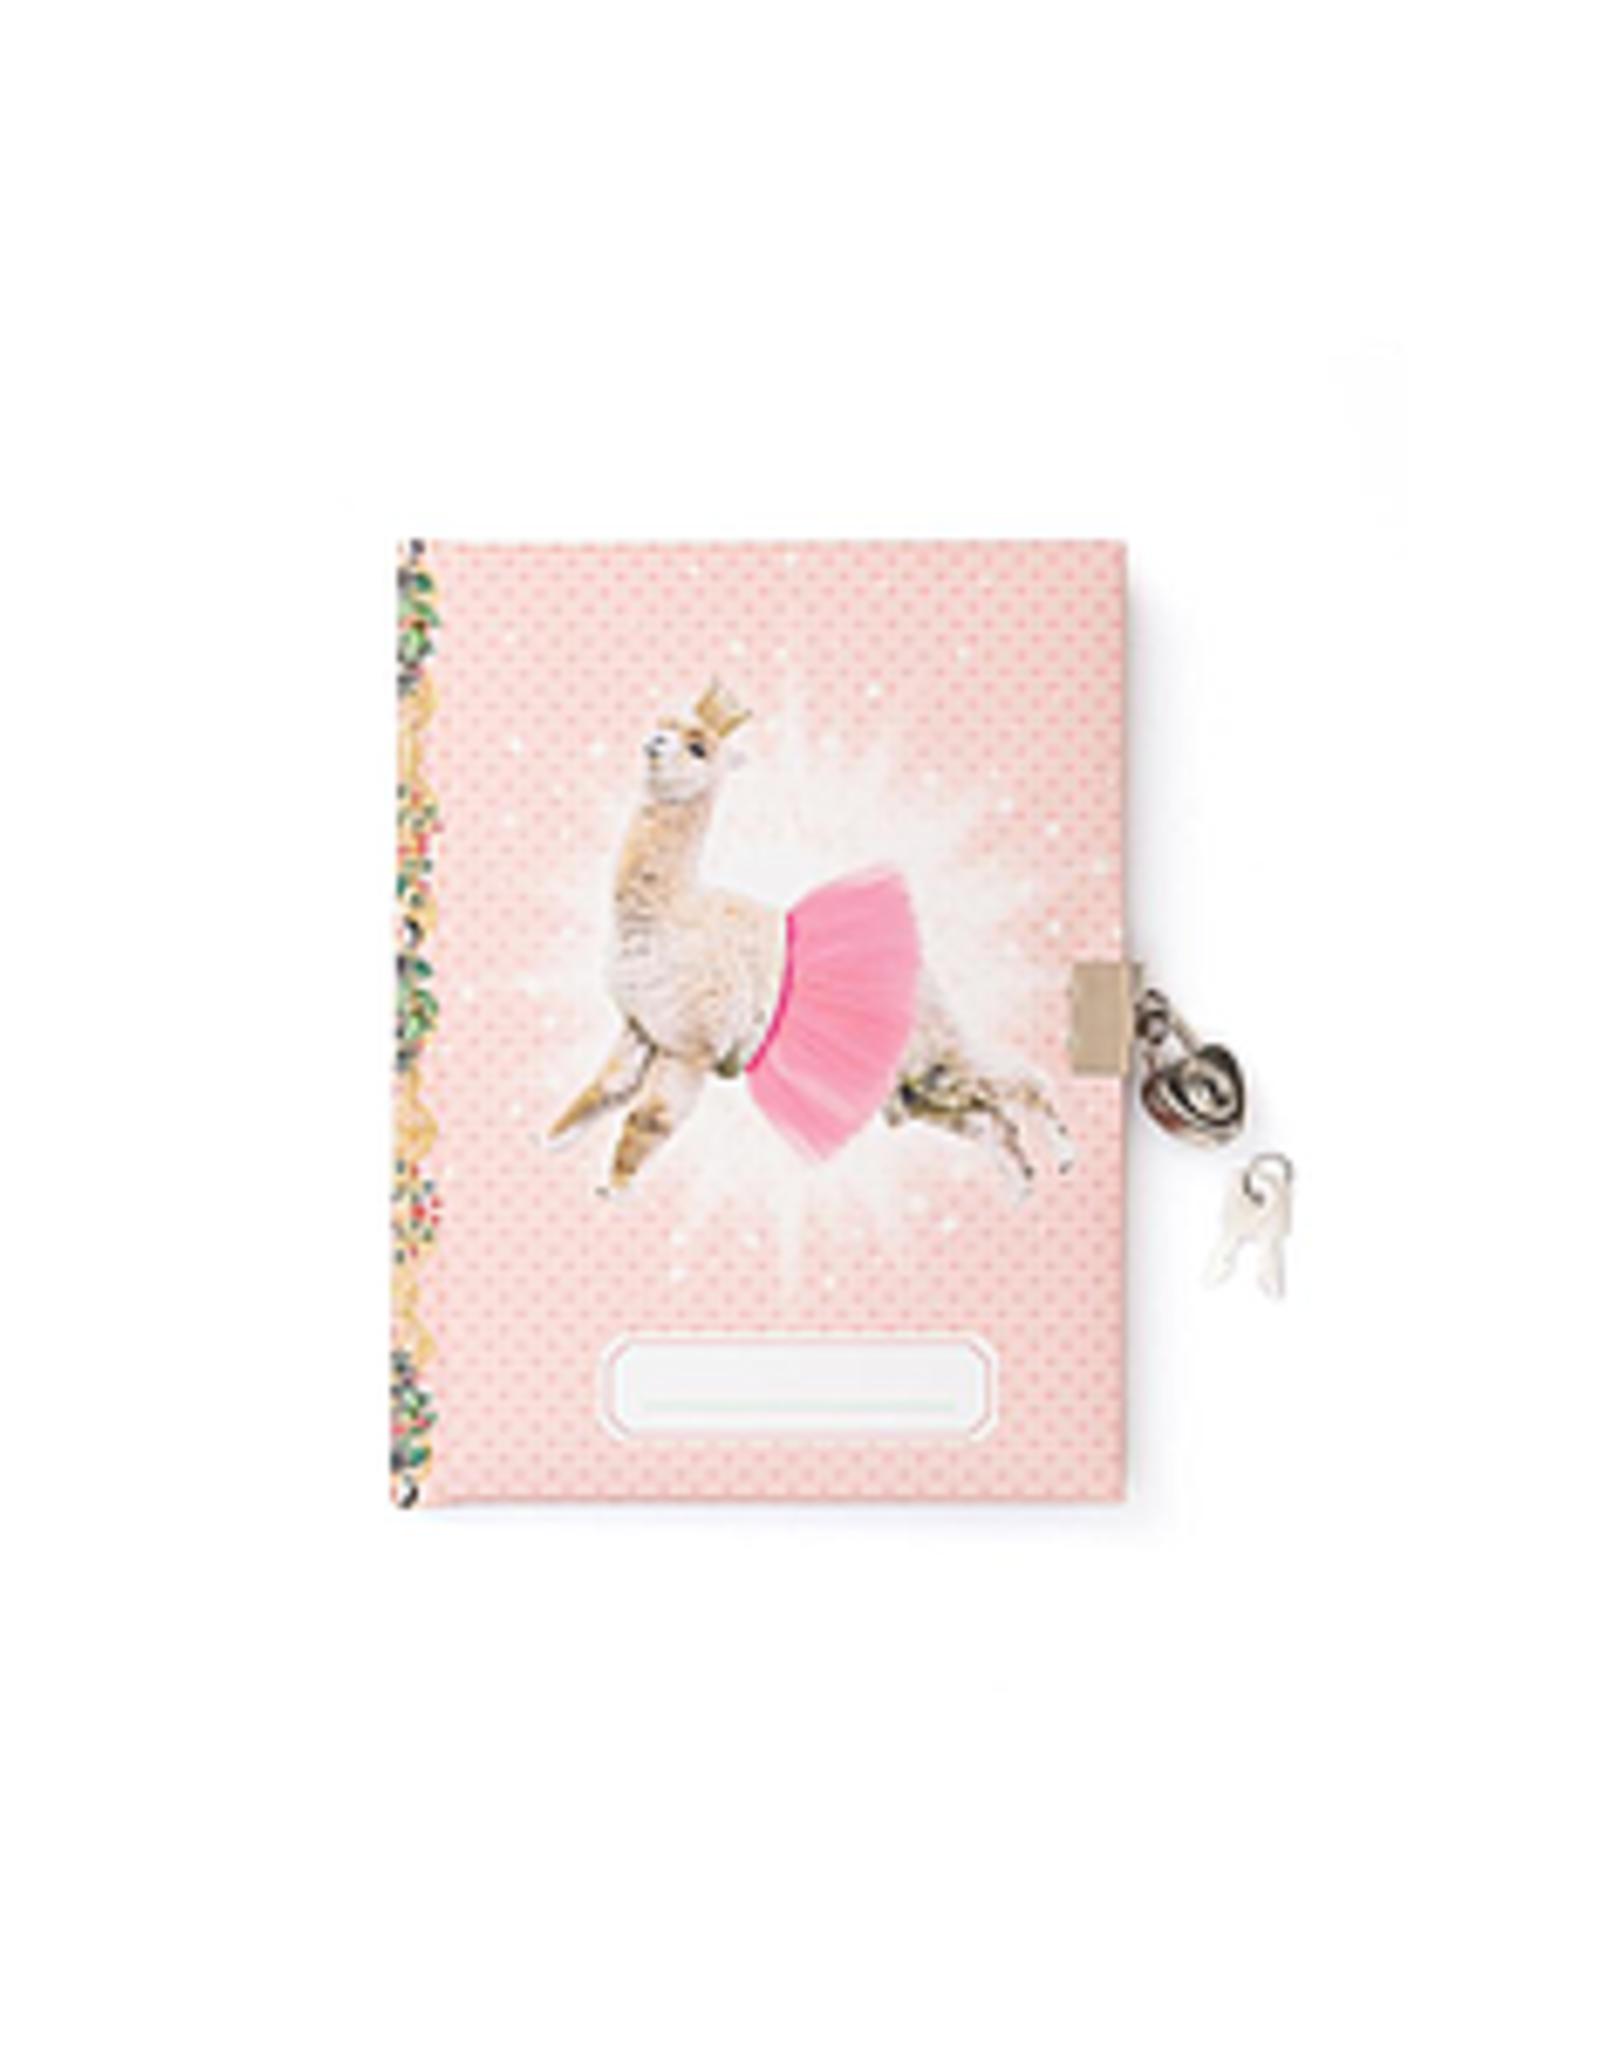 Enfant Terrible Enfant Terrible dagboek alpaca